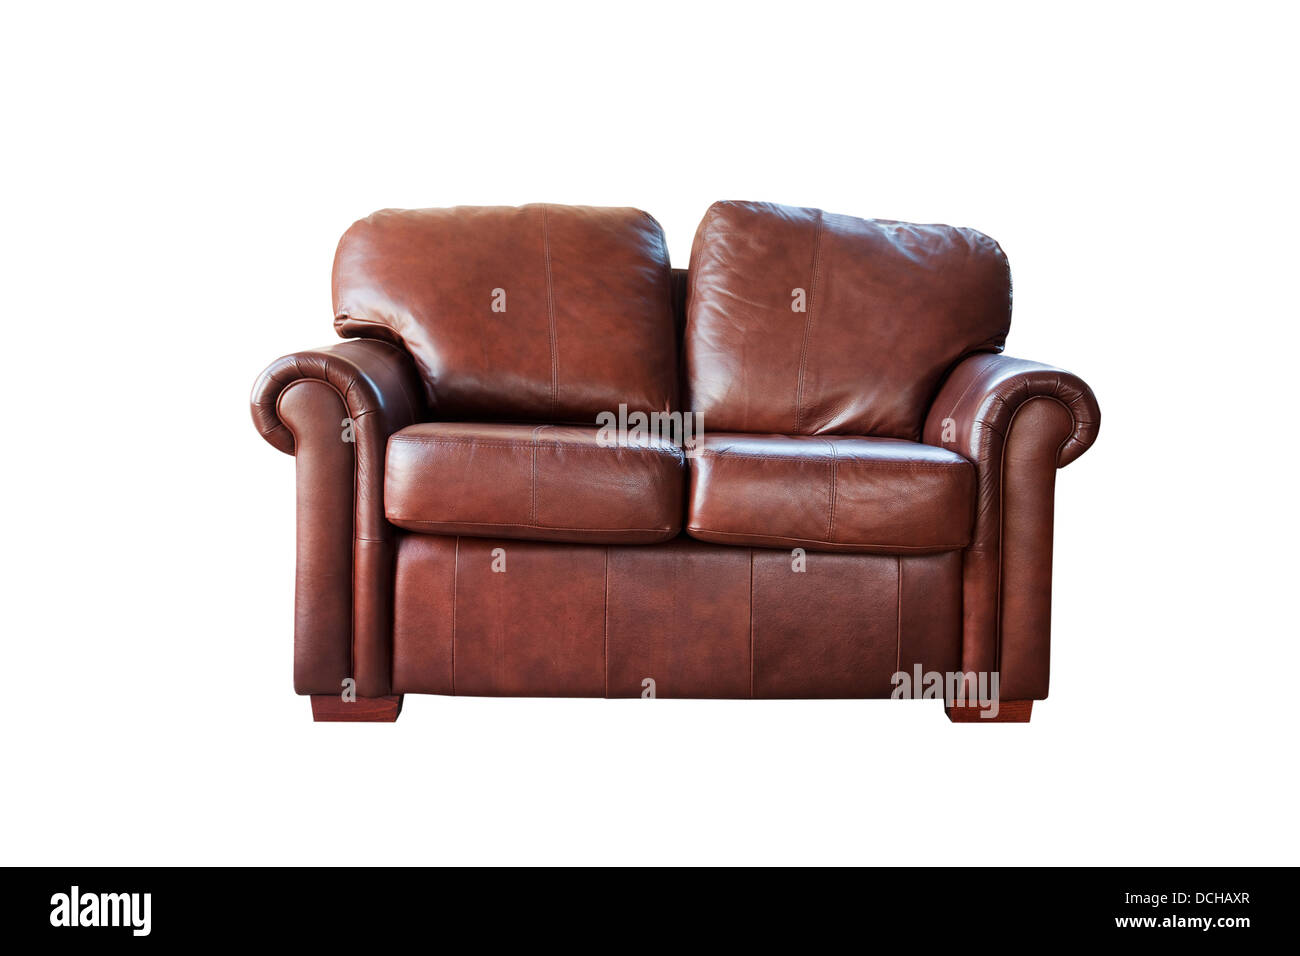 Canapé en cuir marron, cut out on white Photo Stock